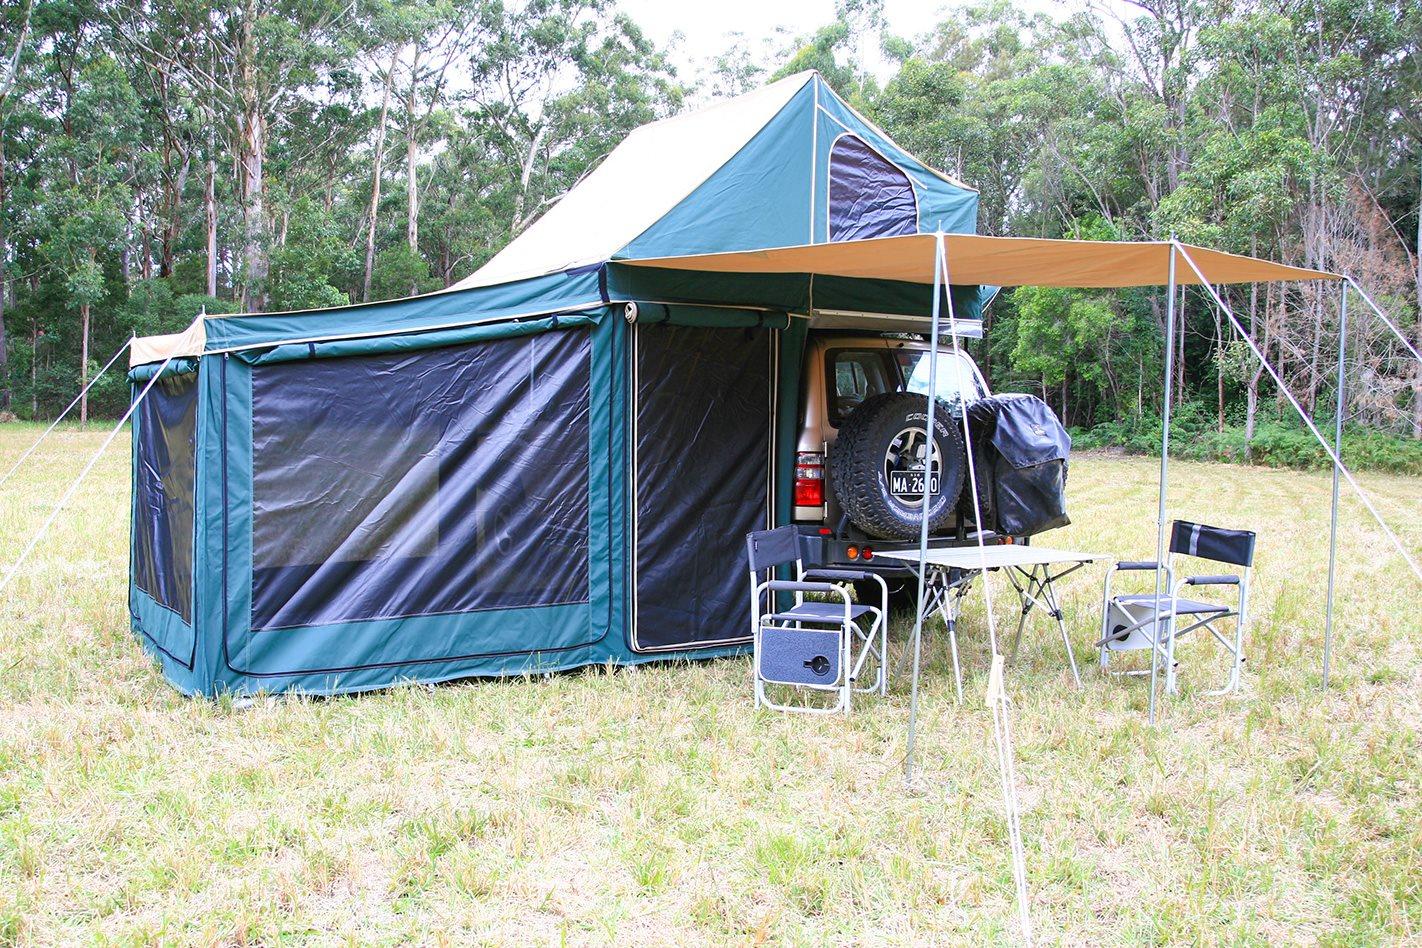 S Cing Australia & Tents In Australia - Best Tent 2018